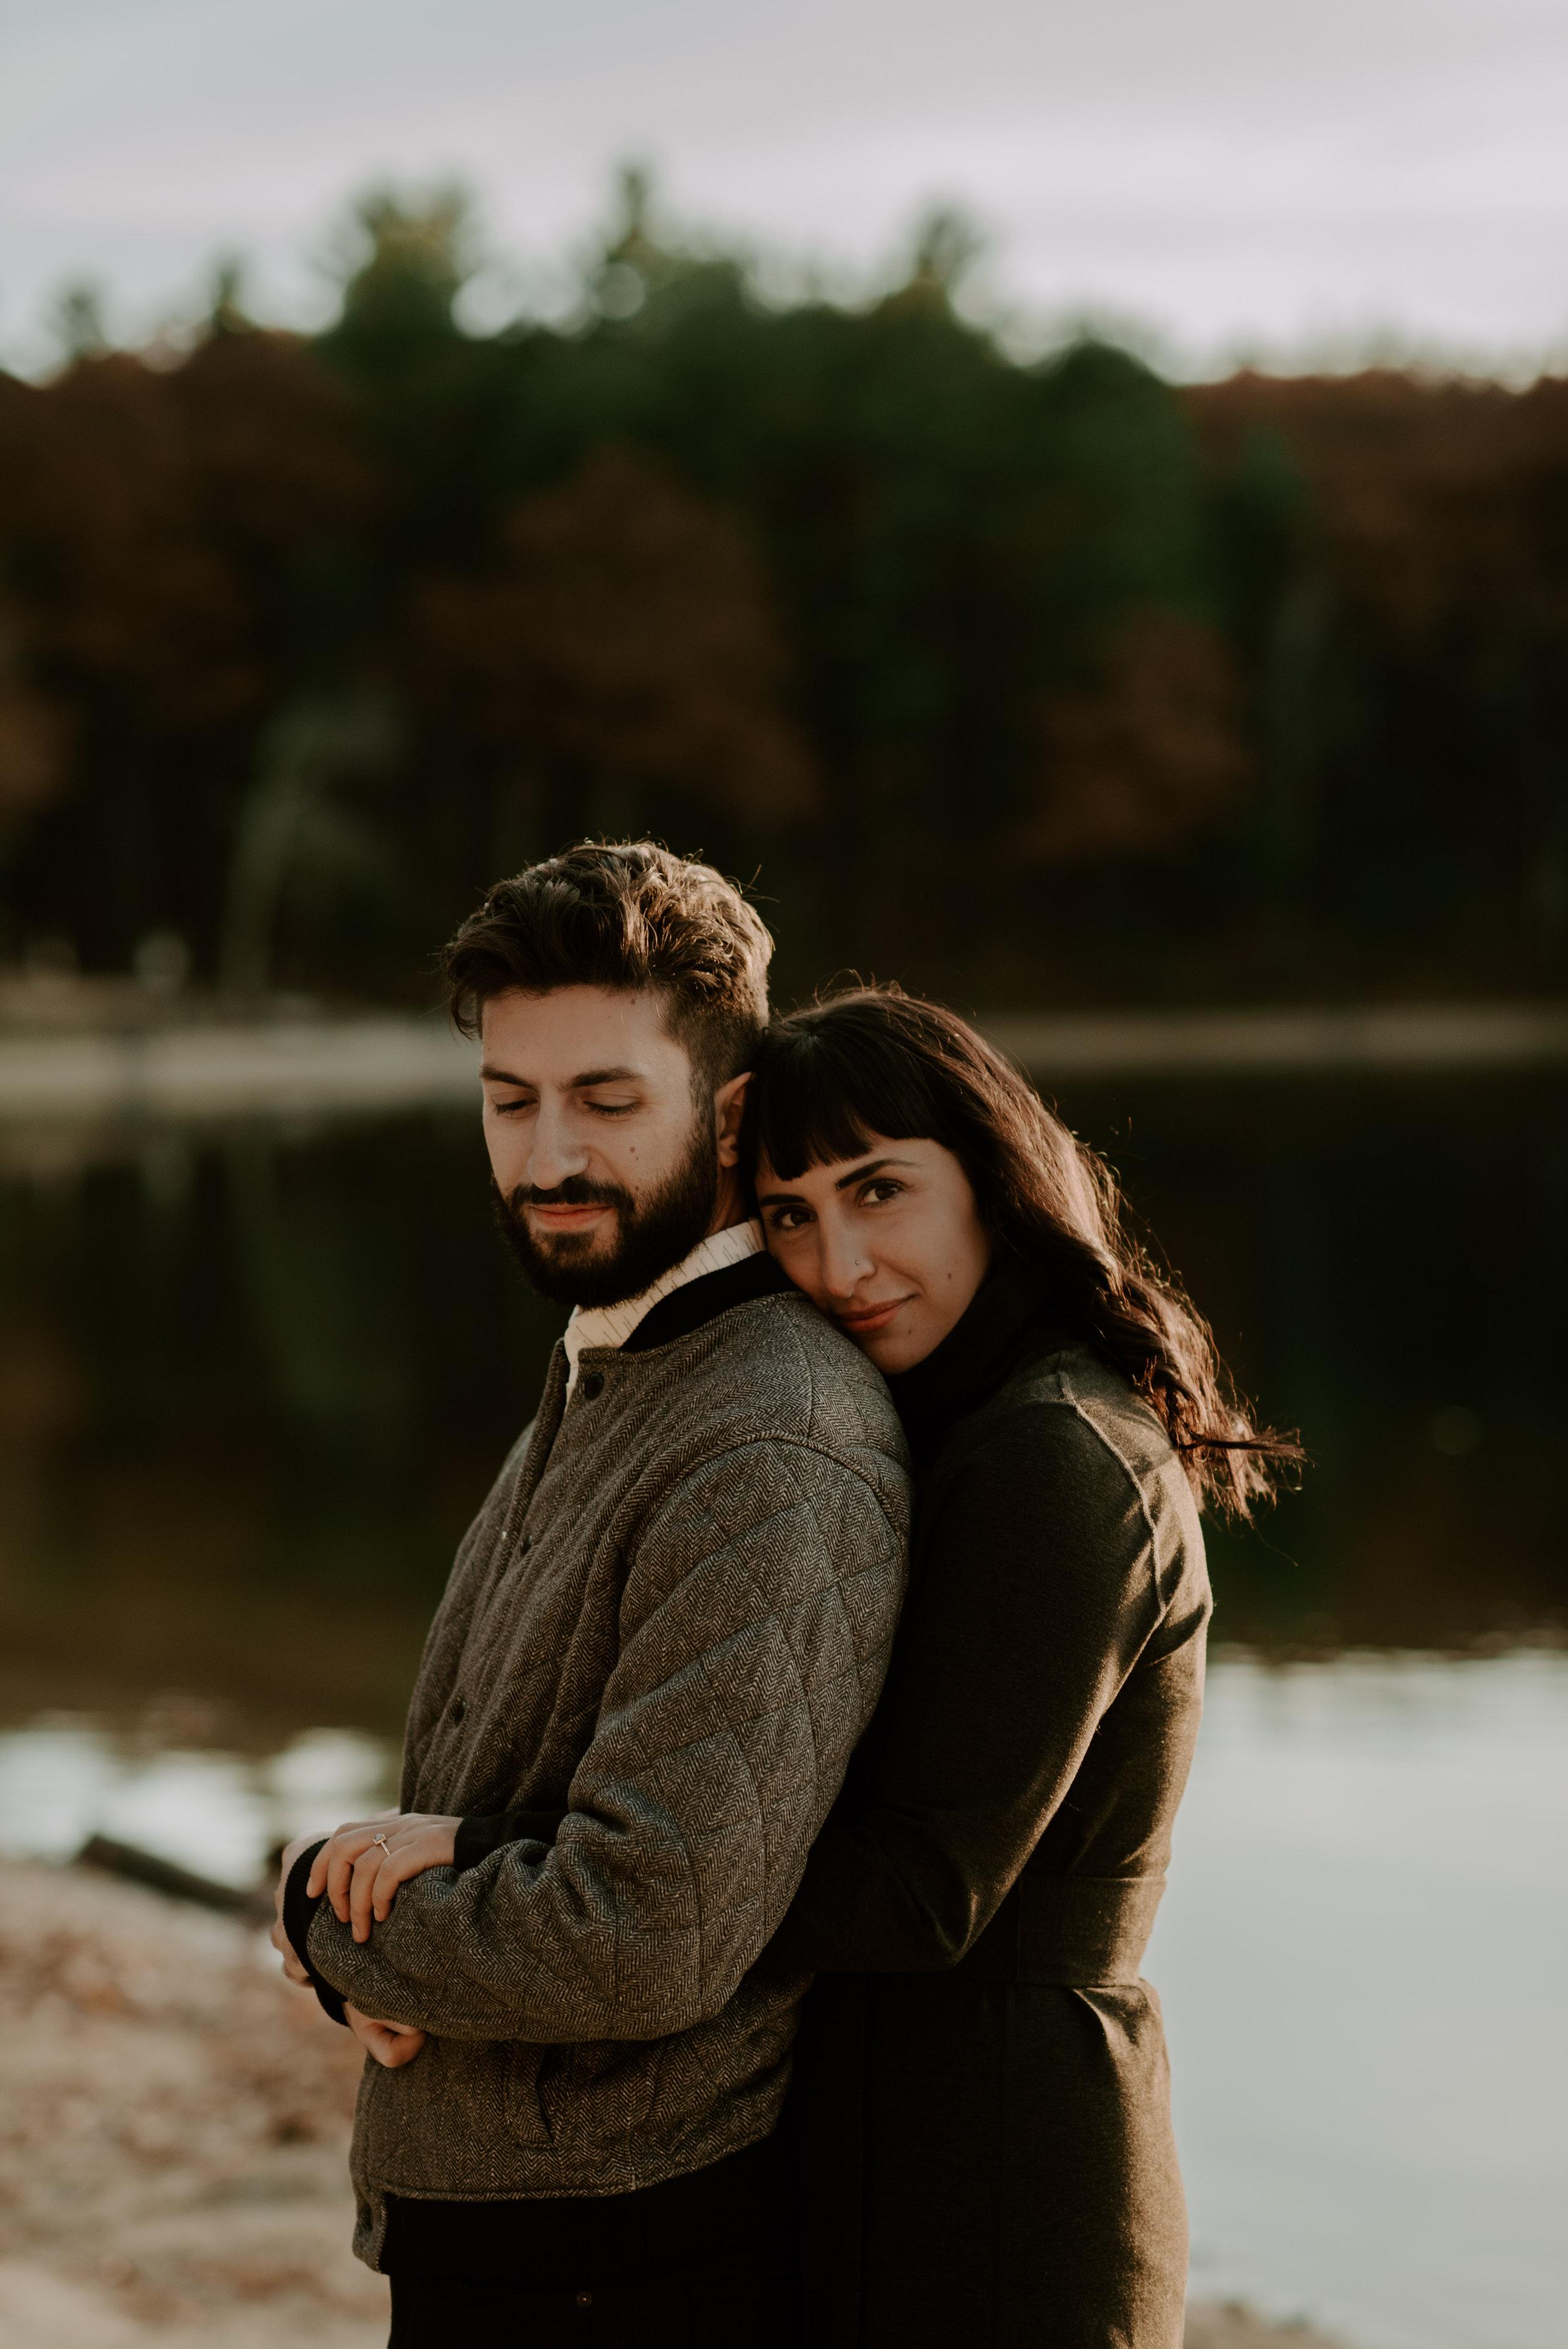 Kiki and Michael's Autumn Walden Pond Engagement Session | Boston Wedding Photographer